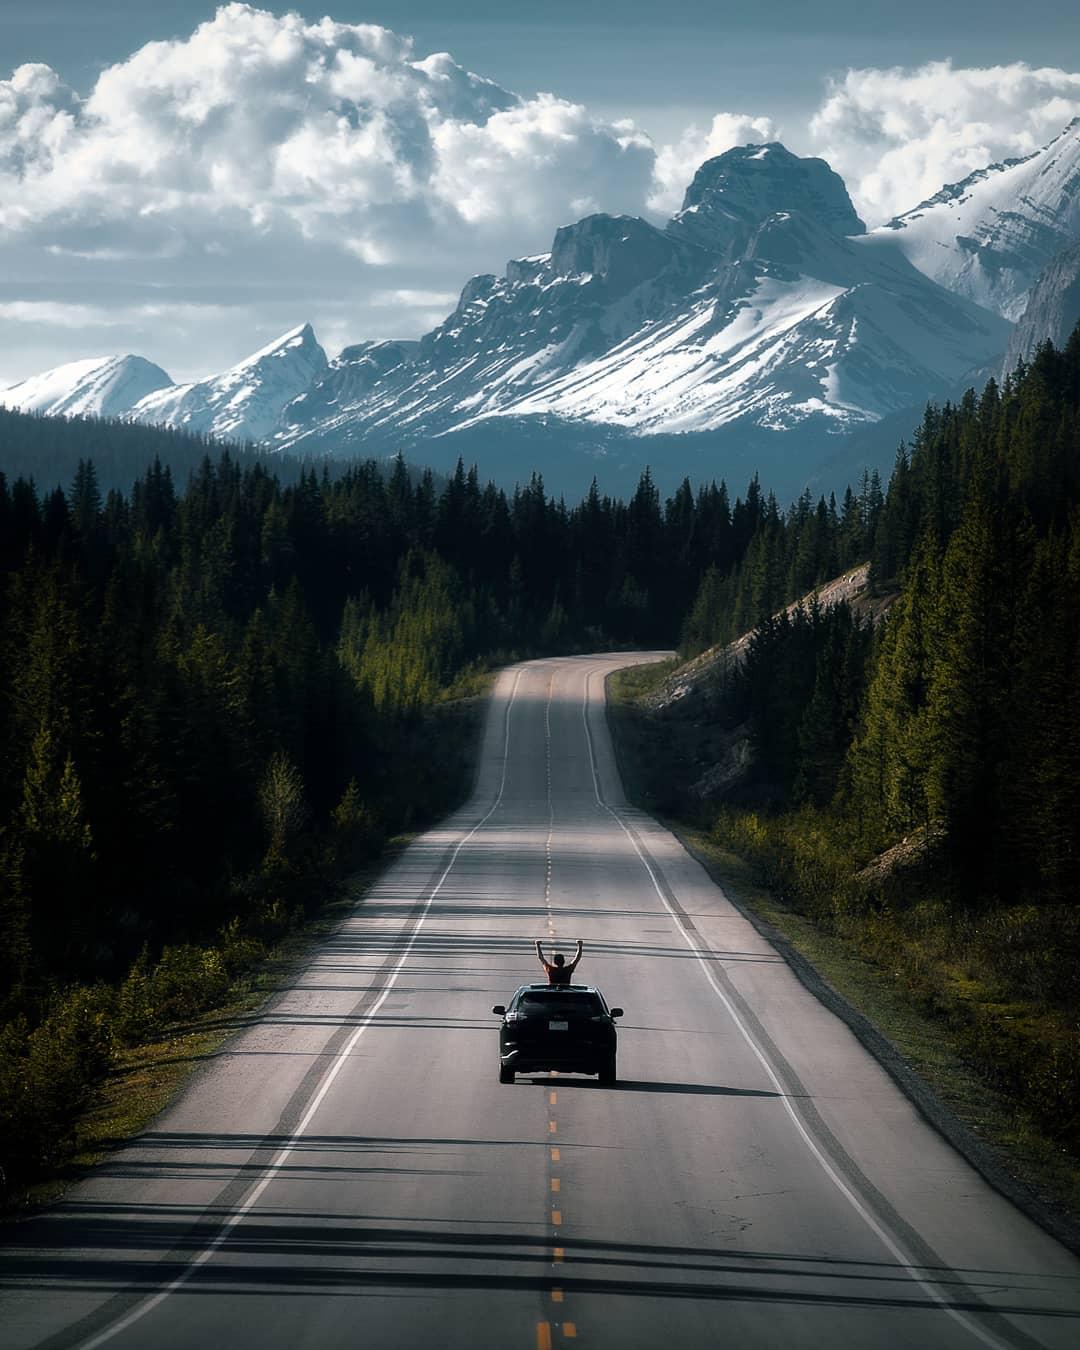 Путешествия и природа на снимках Таля Варди